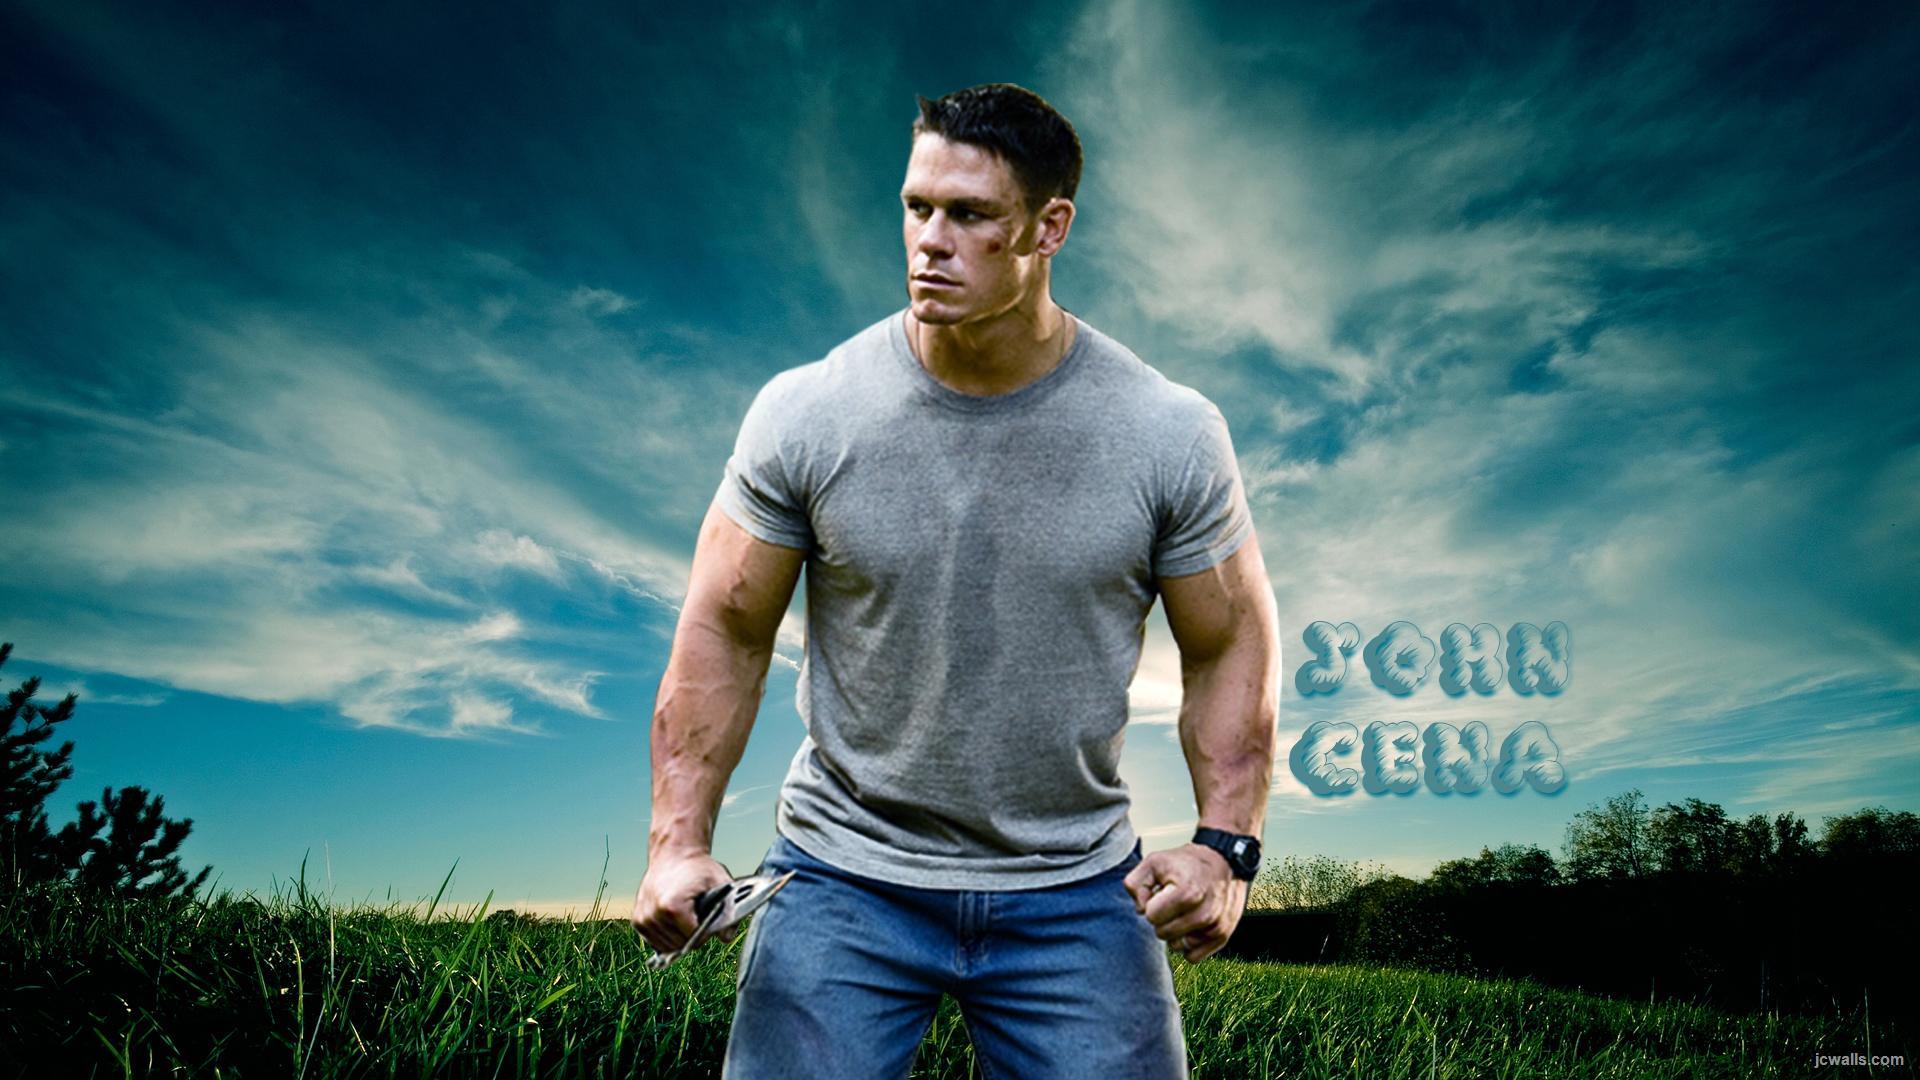 john cena wallpaper t shirt